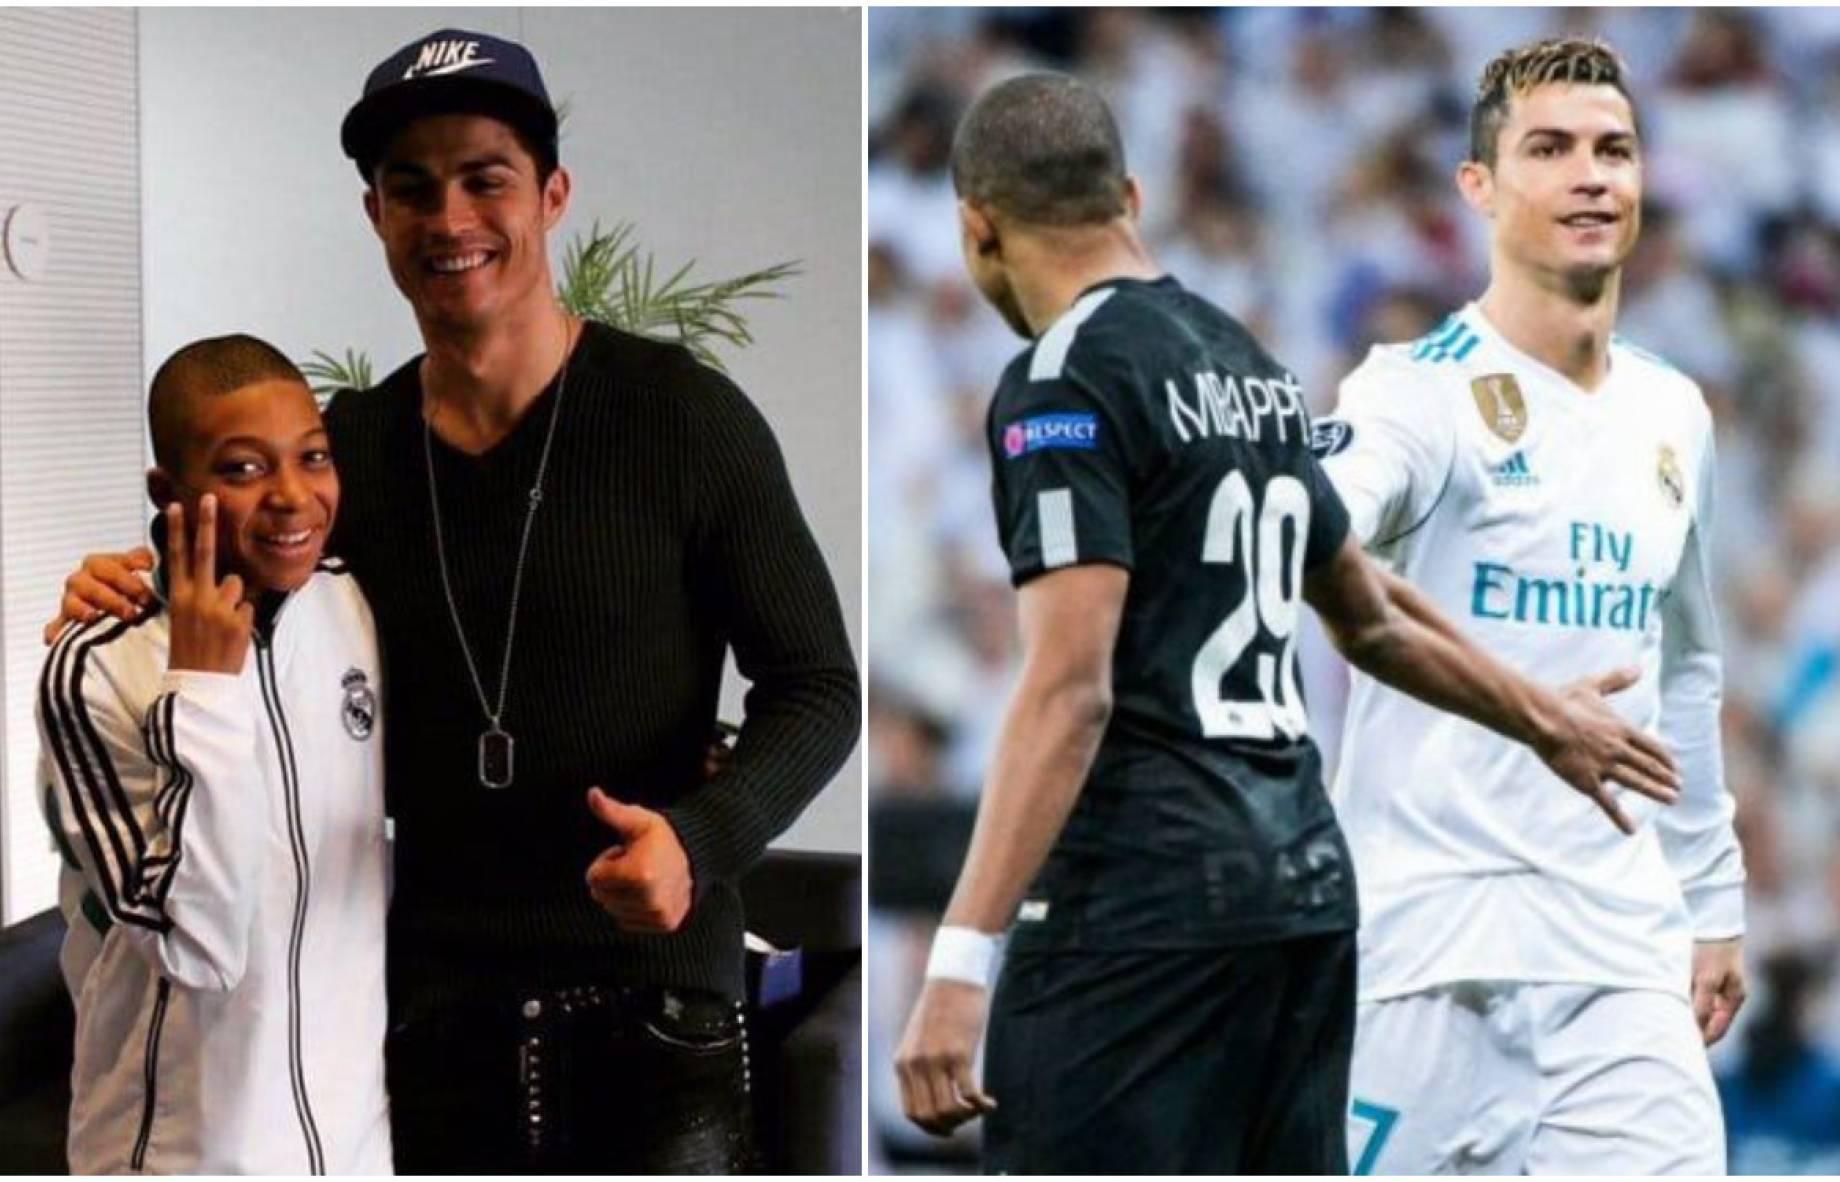 Luis Campos Yakin di Real Madrid Kylian Mbappe Bisa Melebihi Perolehan Ballon D'Or Cristiano Ronaldo